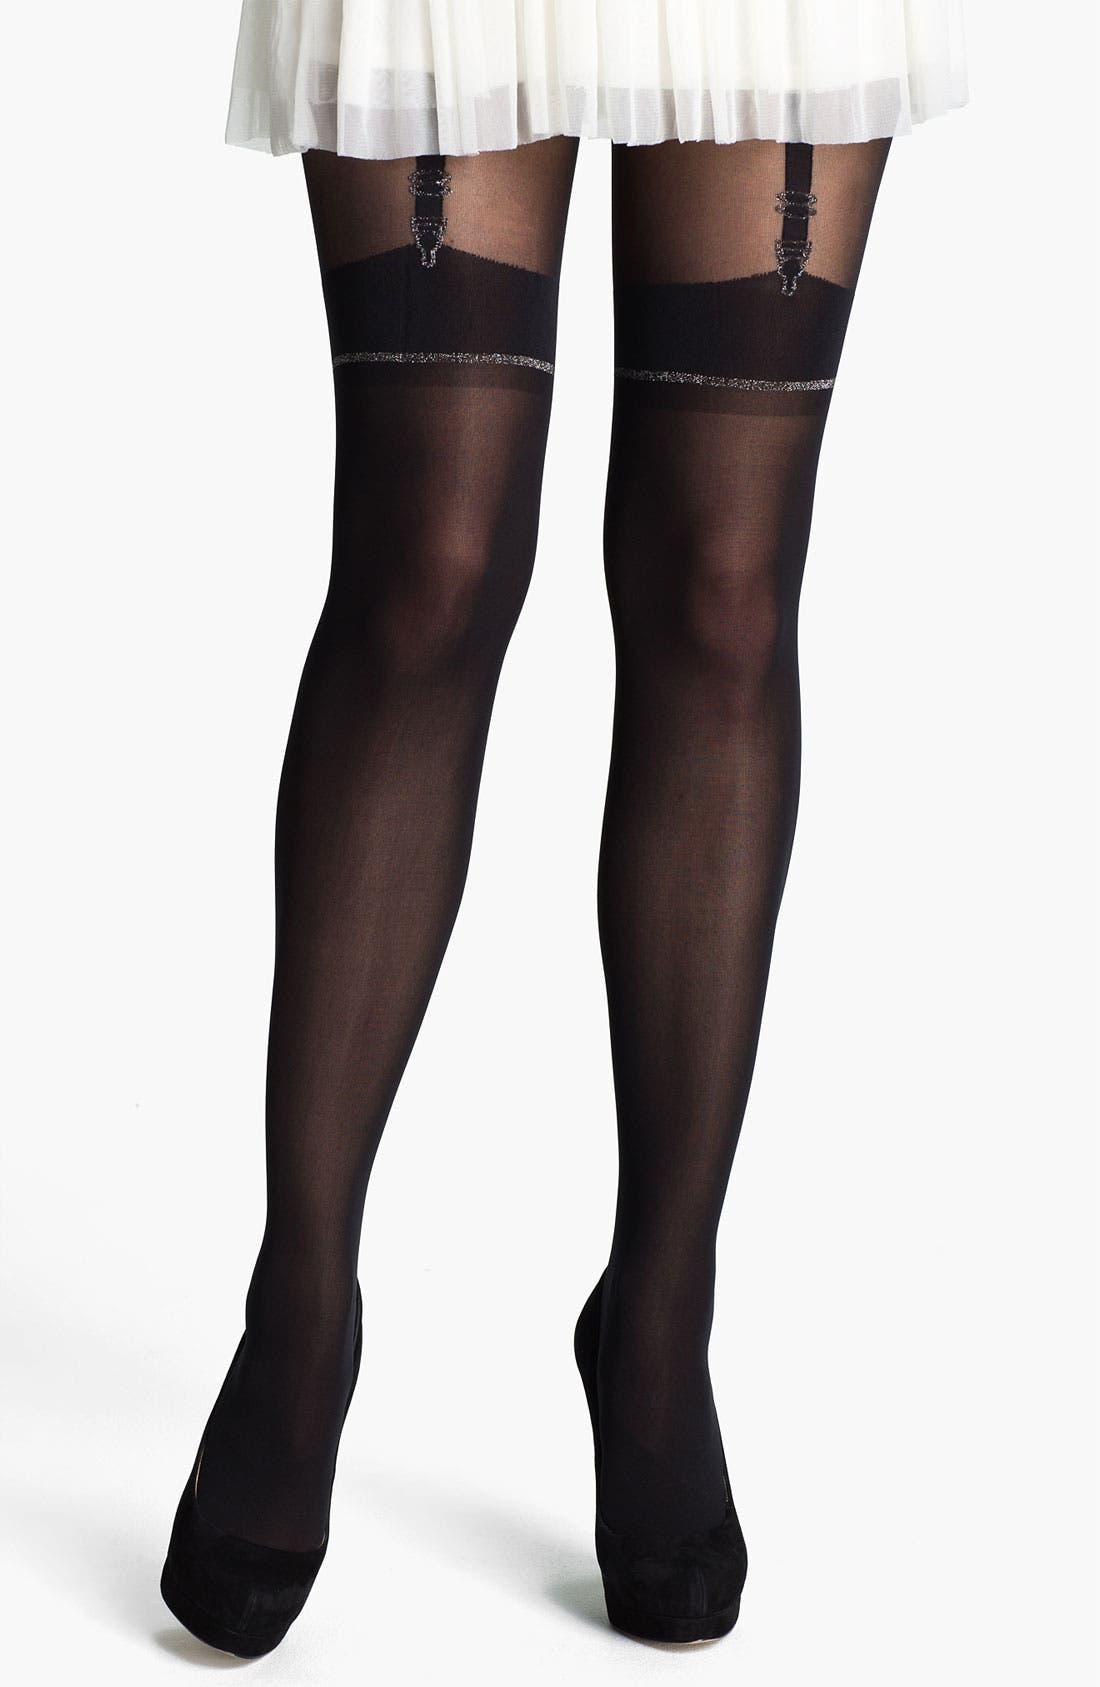 pretty polly  u0026 39 stunning u0026 39  mock suspender tights